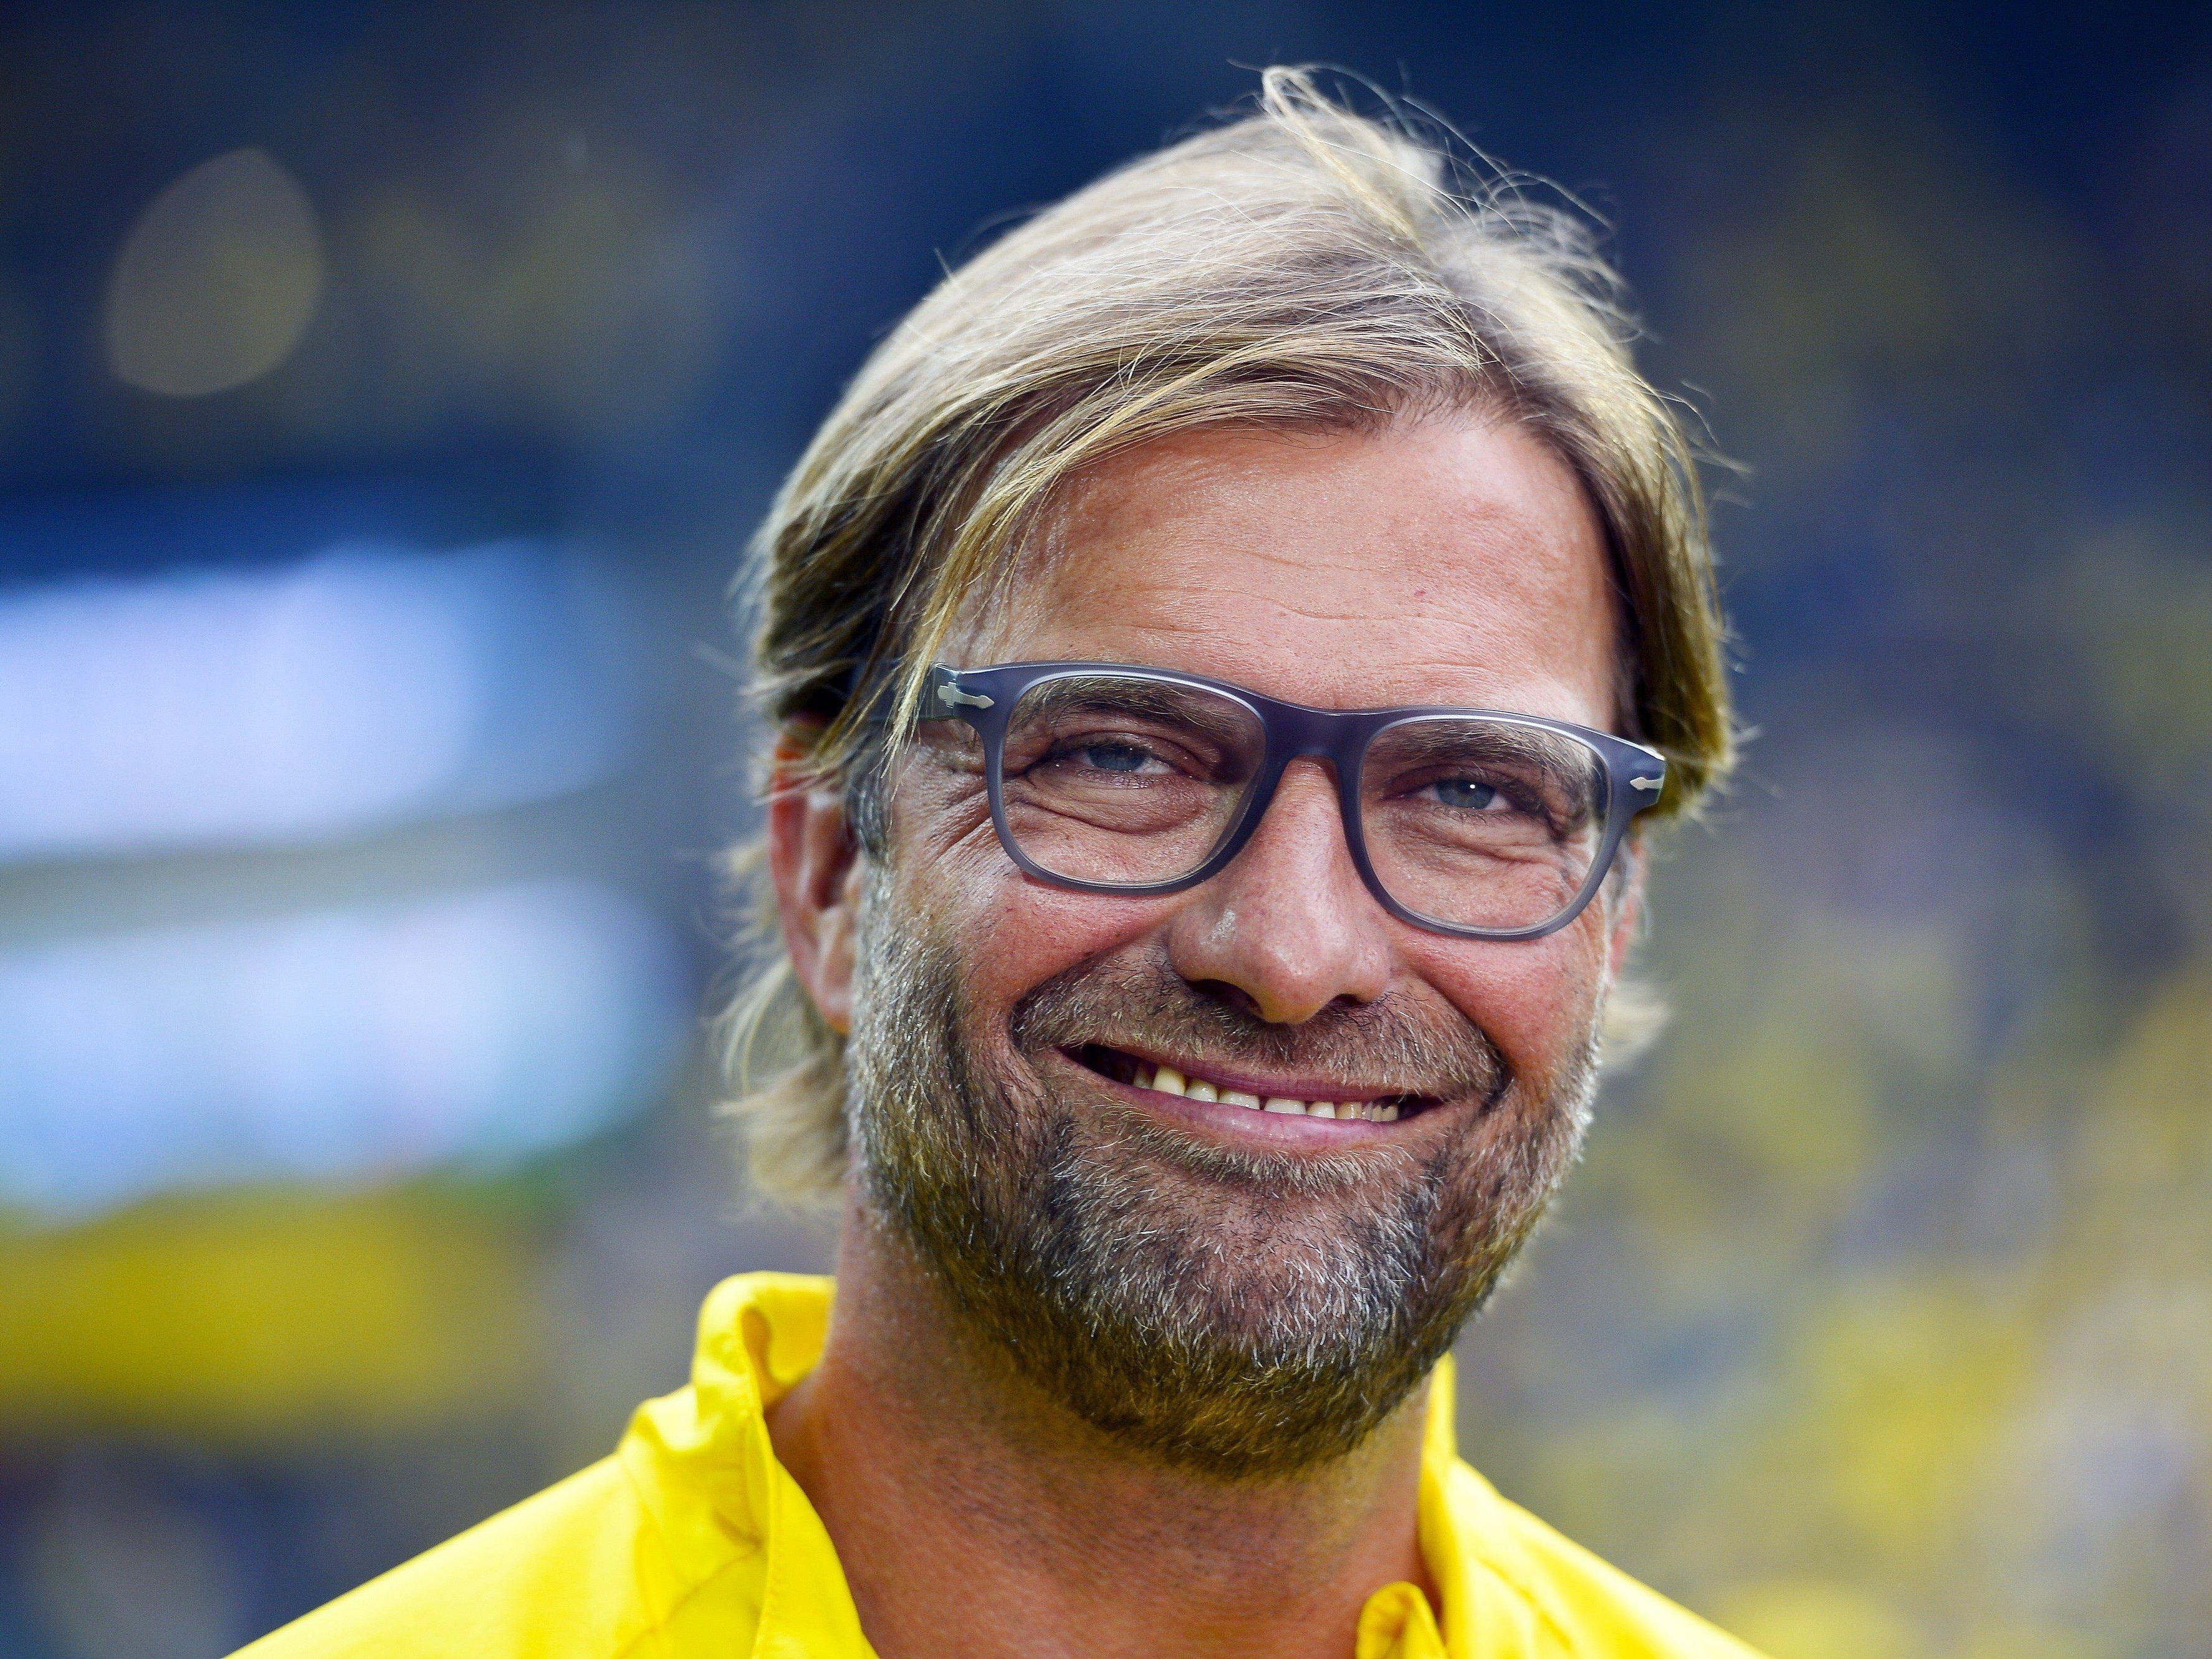 Medien: Klopp-Vertrag beim FC Liverpool perfekt